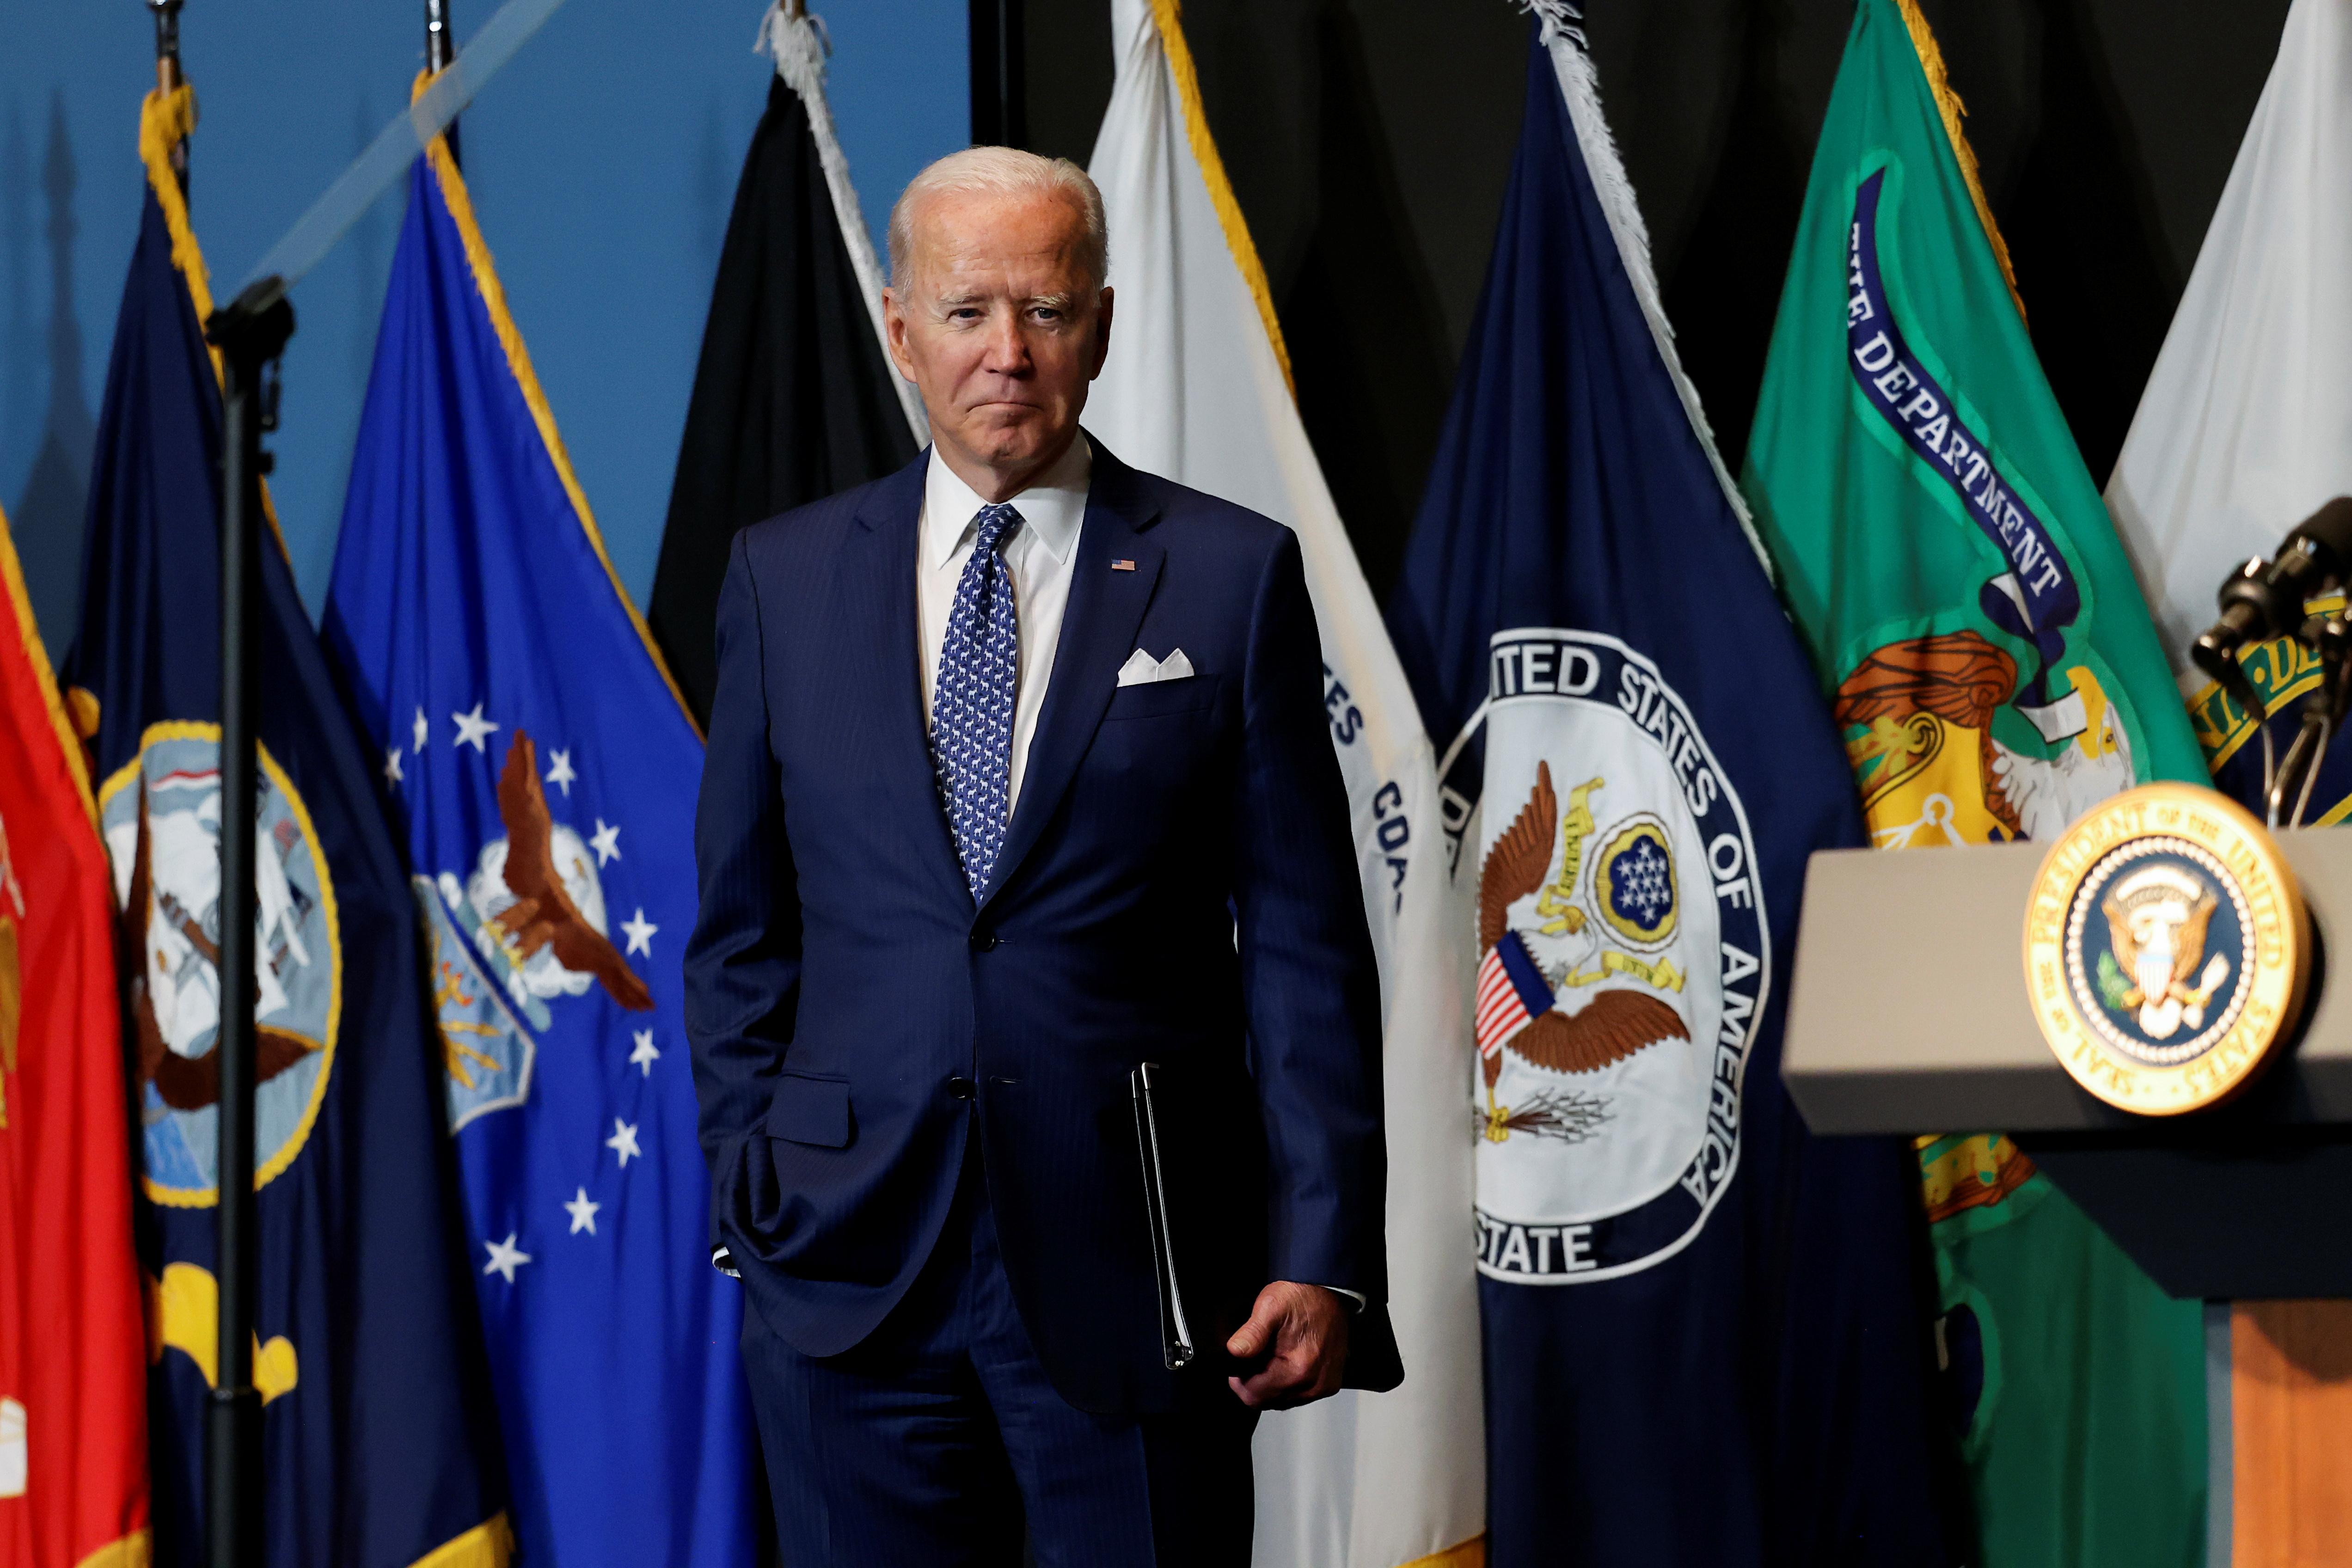 U.S. President Joe Biden departs after delivering remarks to members of